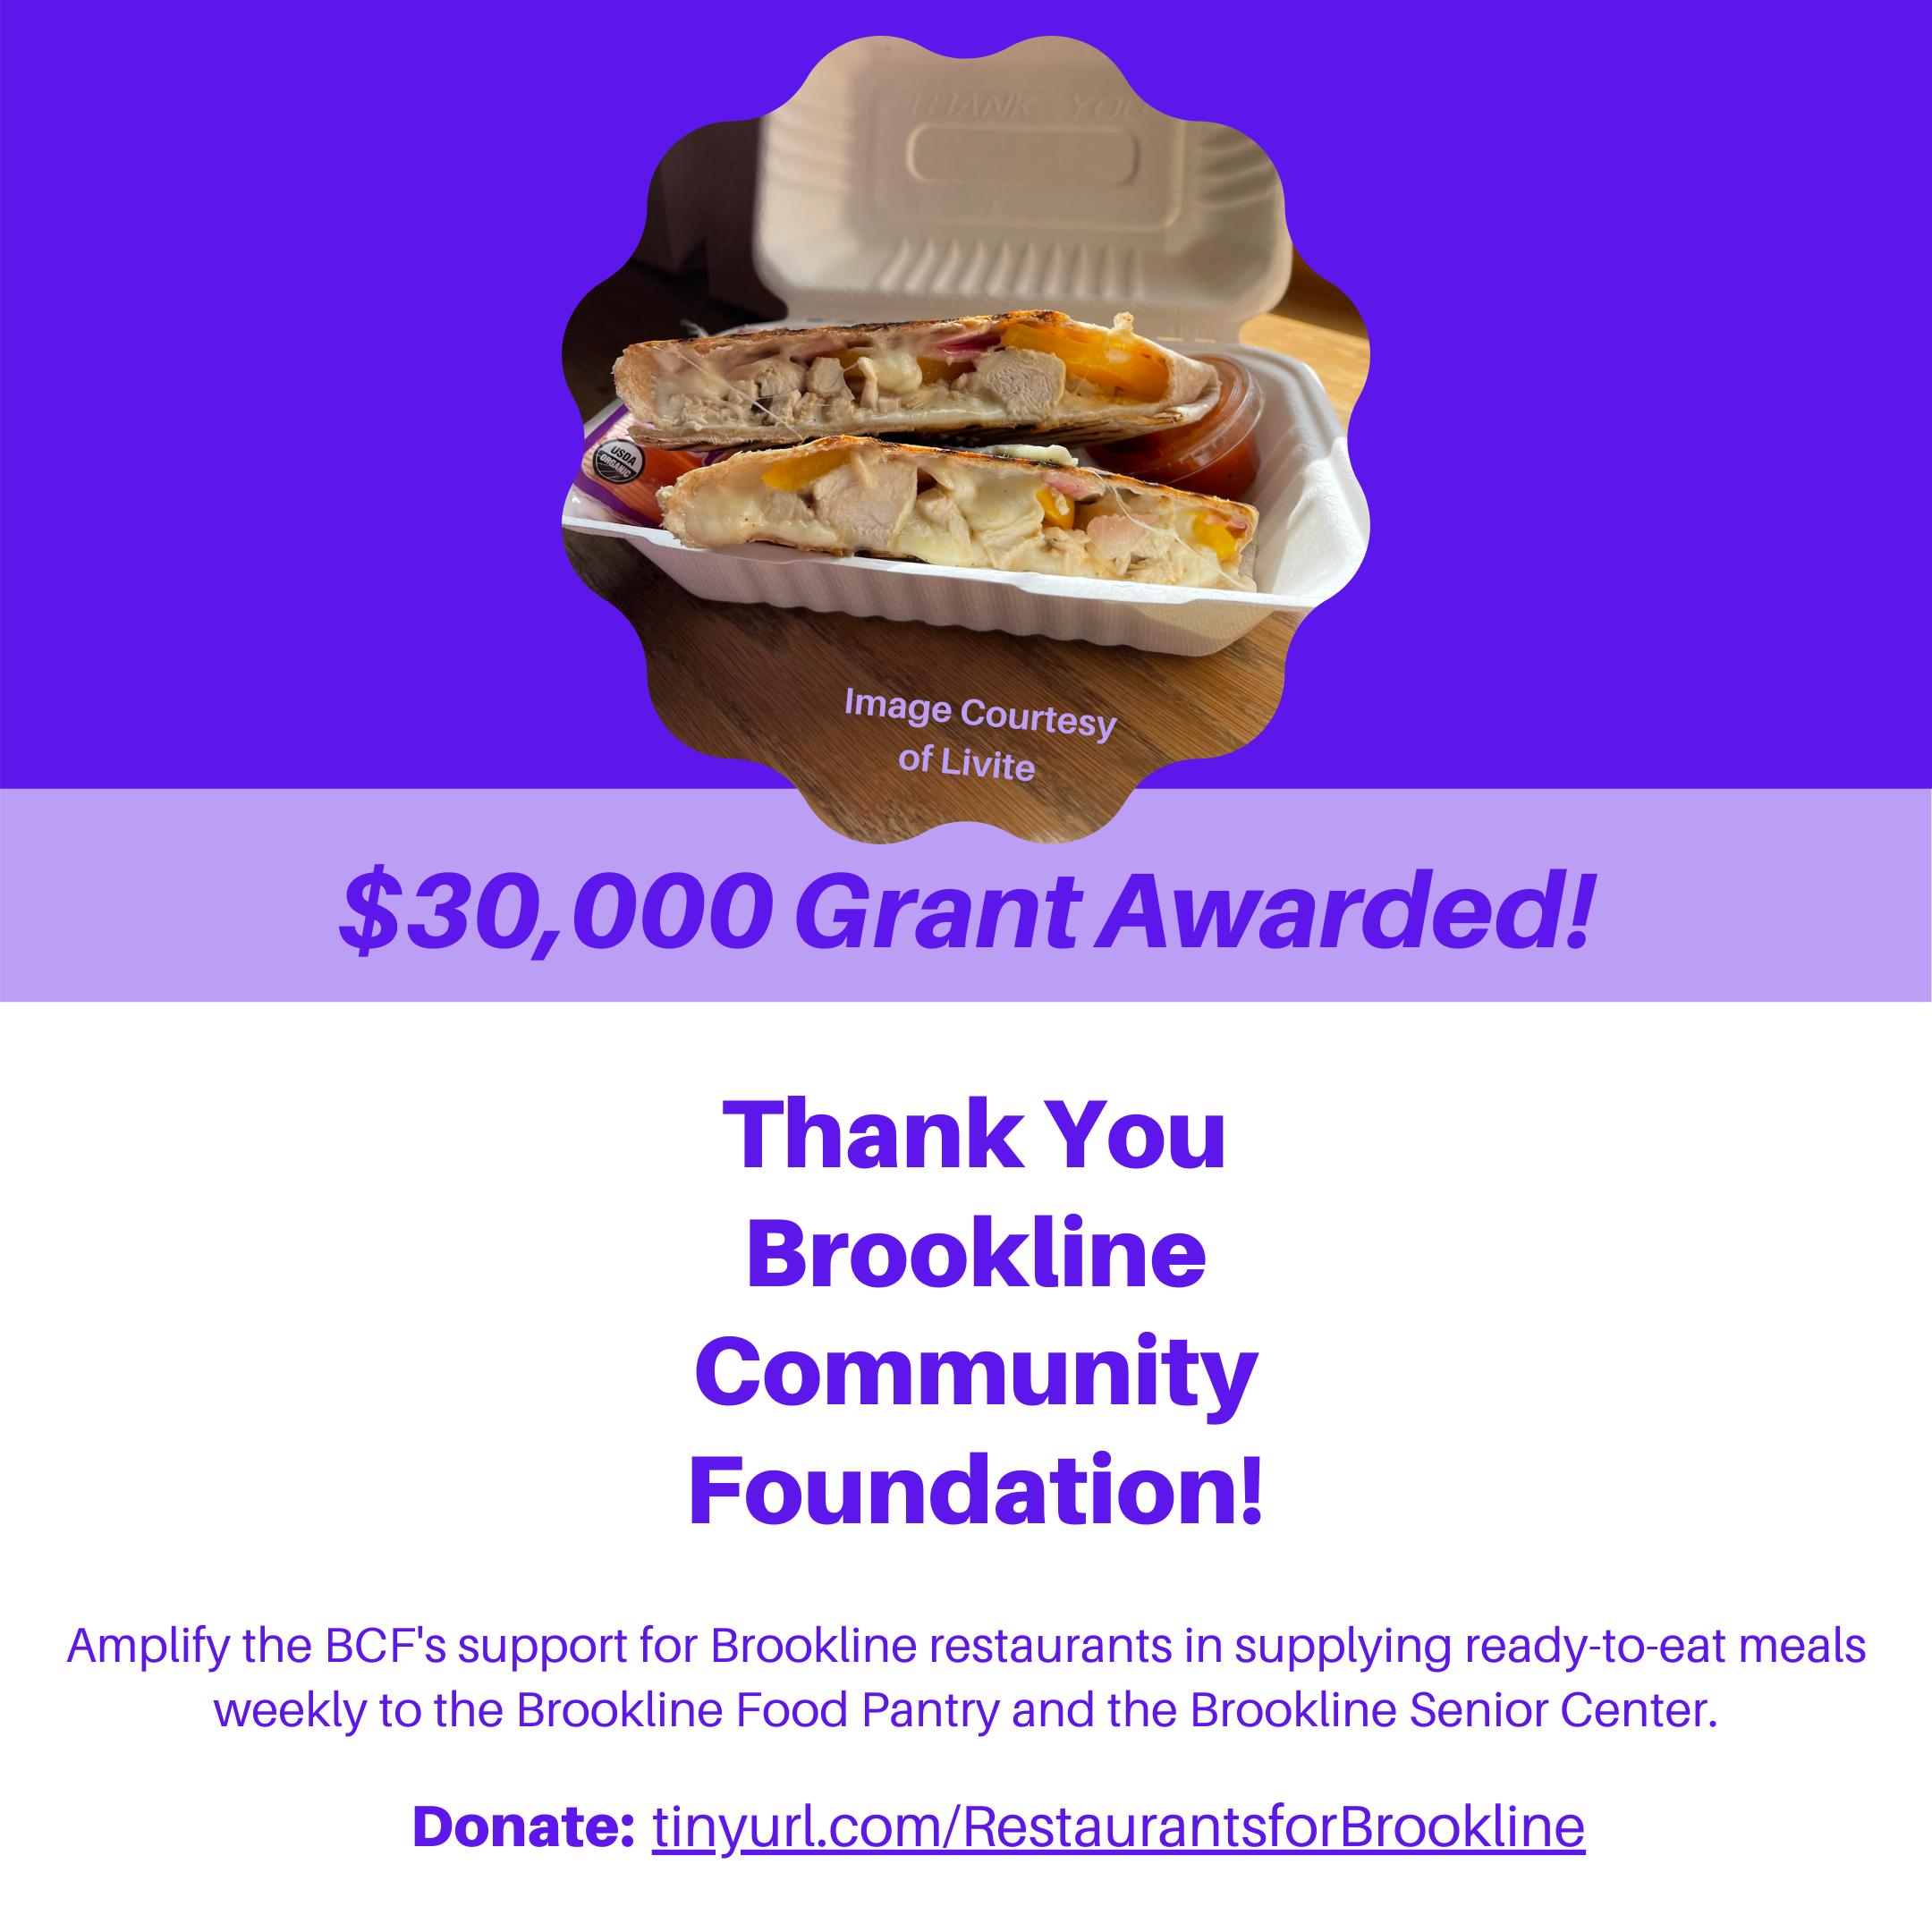 Donate to Restaurants for Brookline